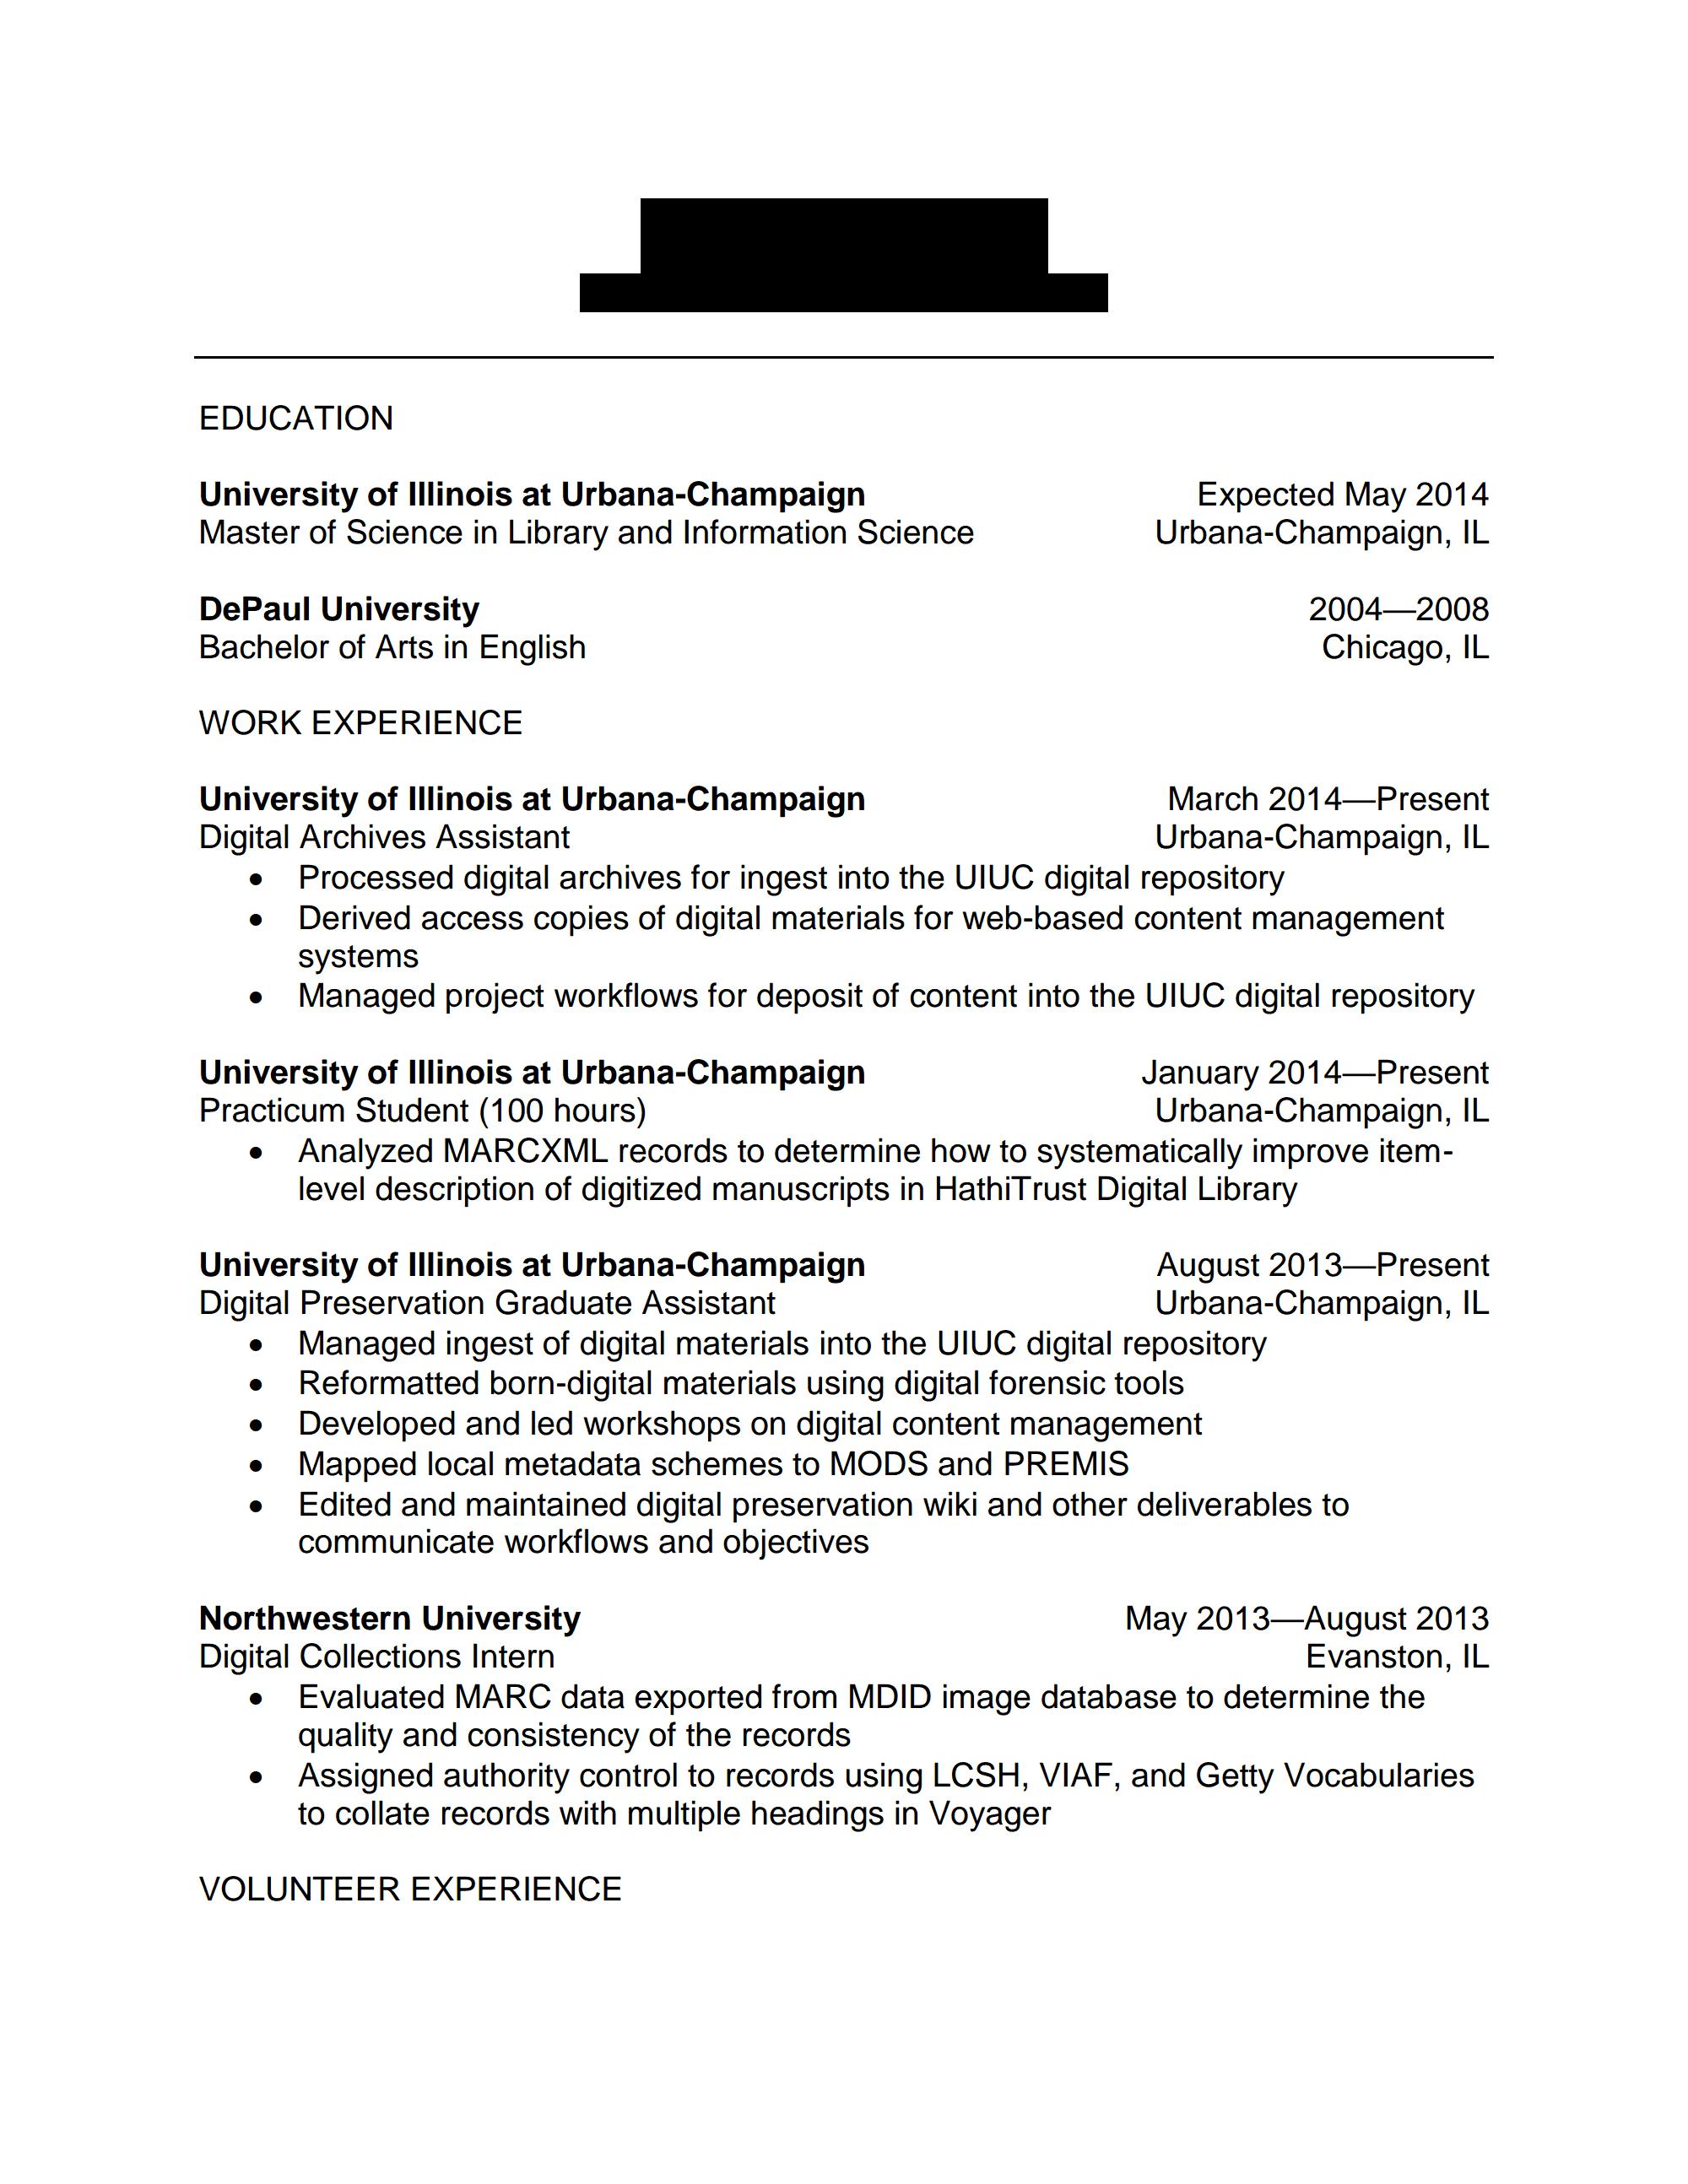 markham public library job application